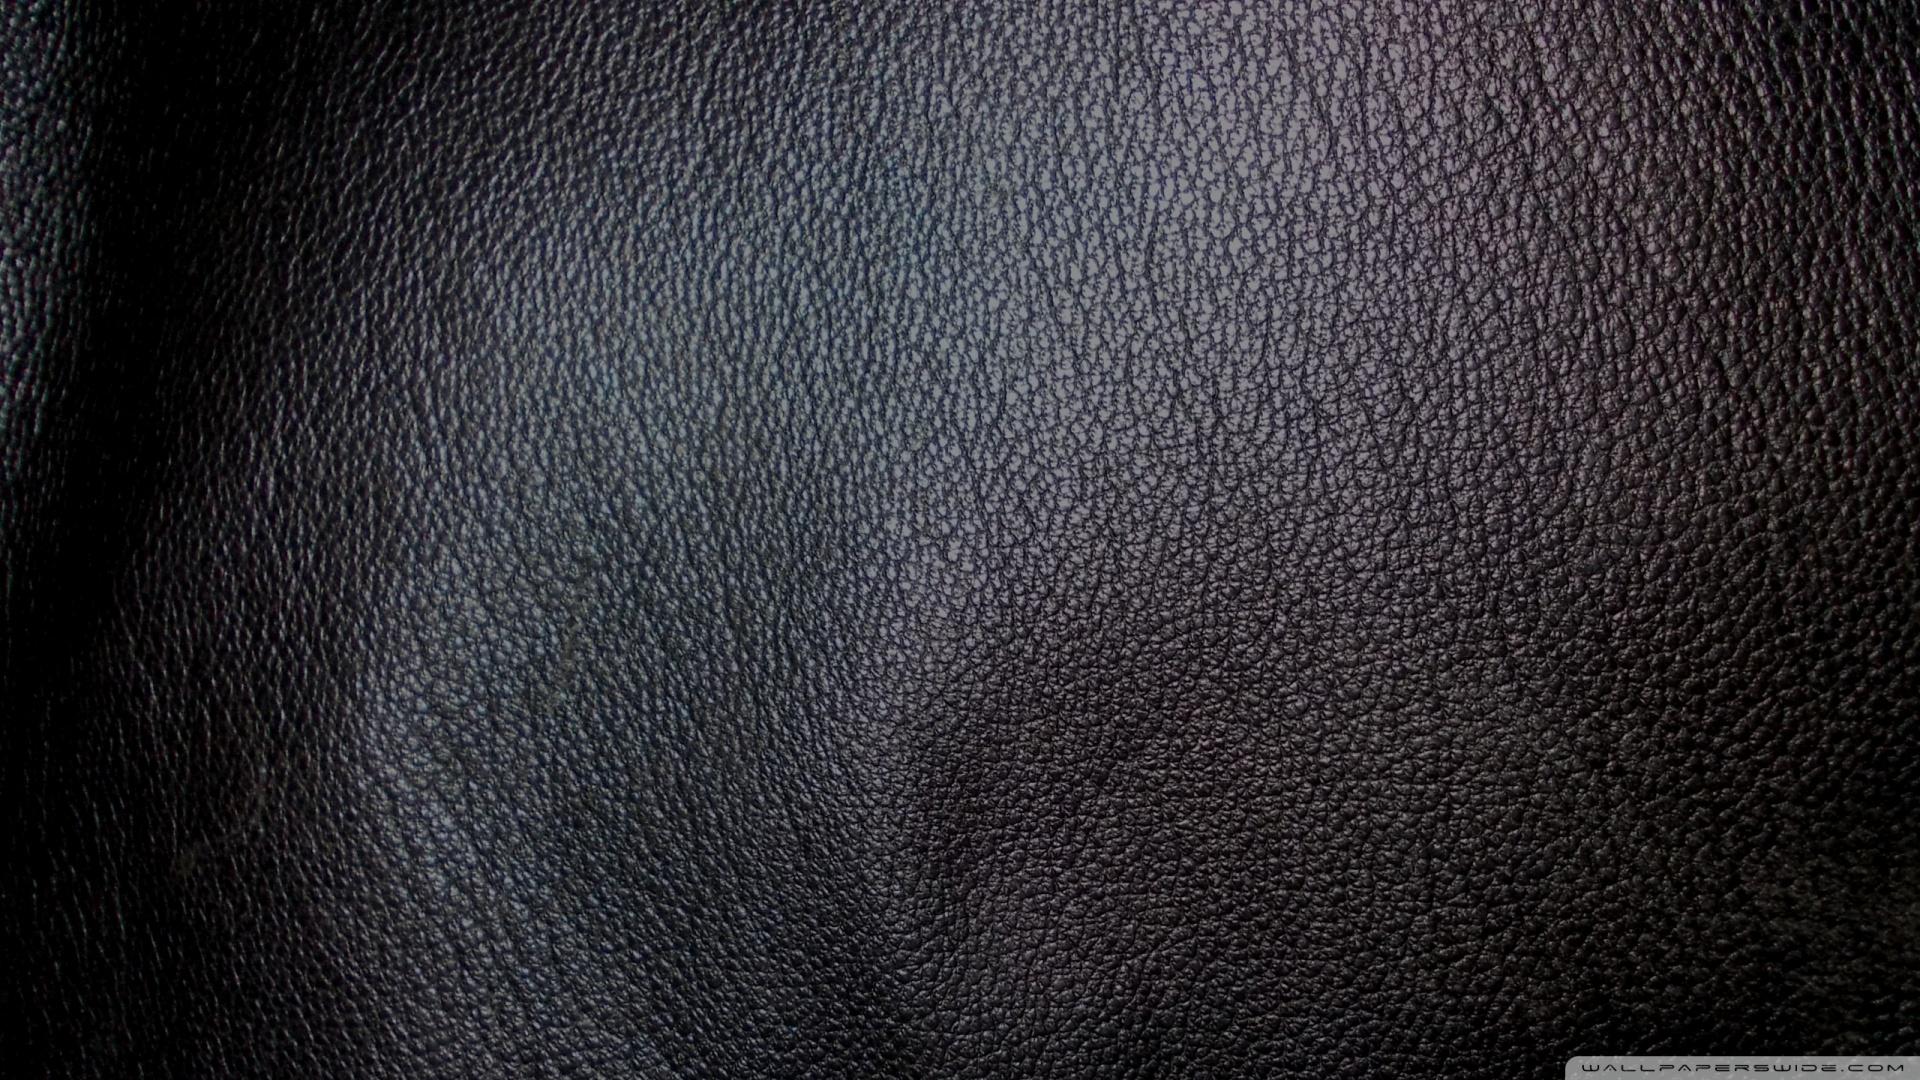 Black Leather Wallpaper 1920x1080 Black Leather 1920x1080